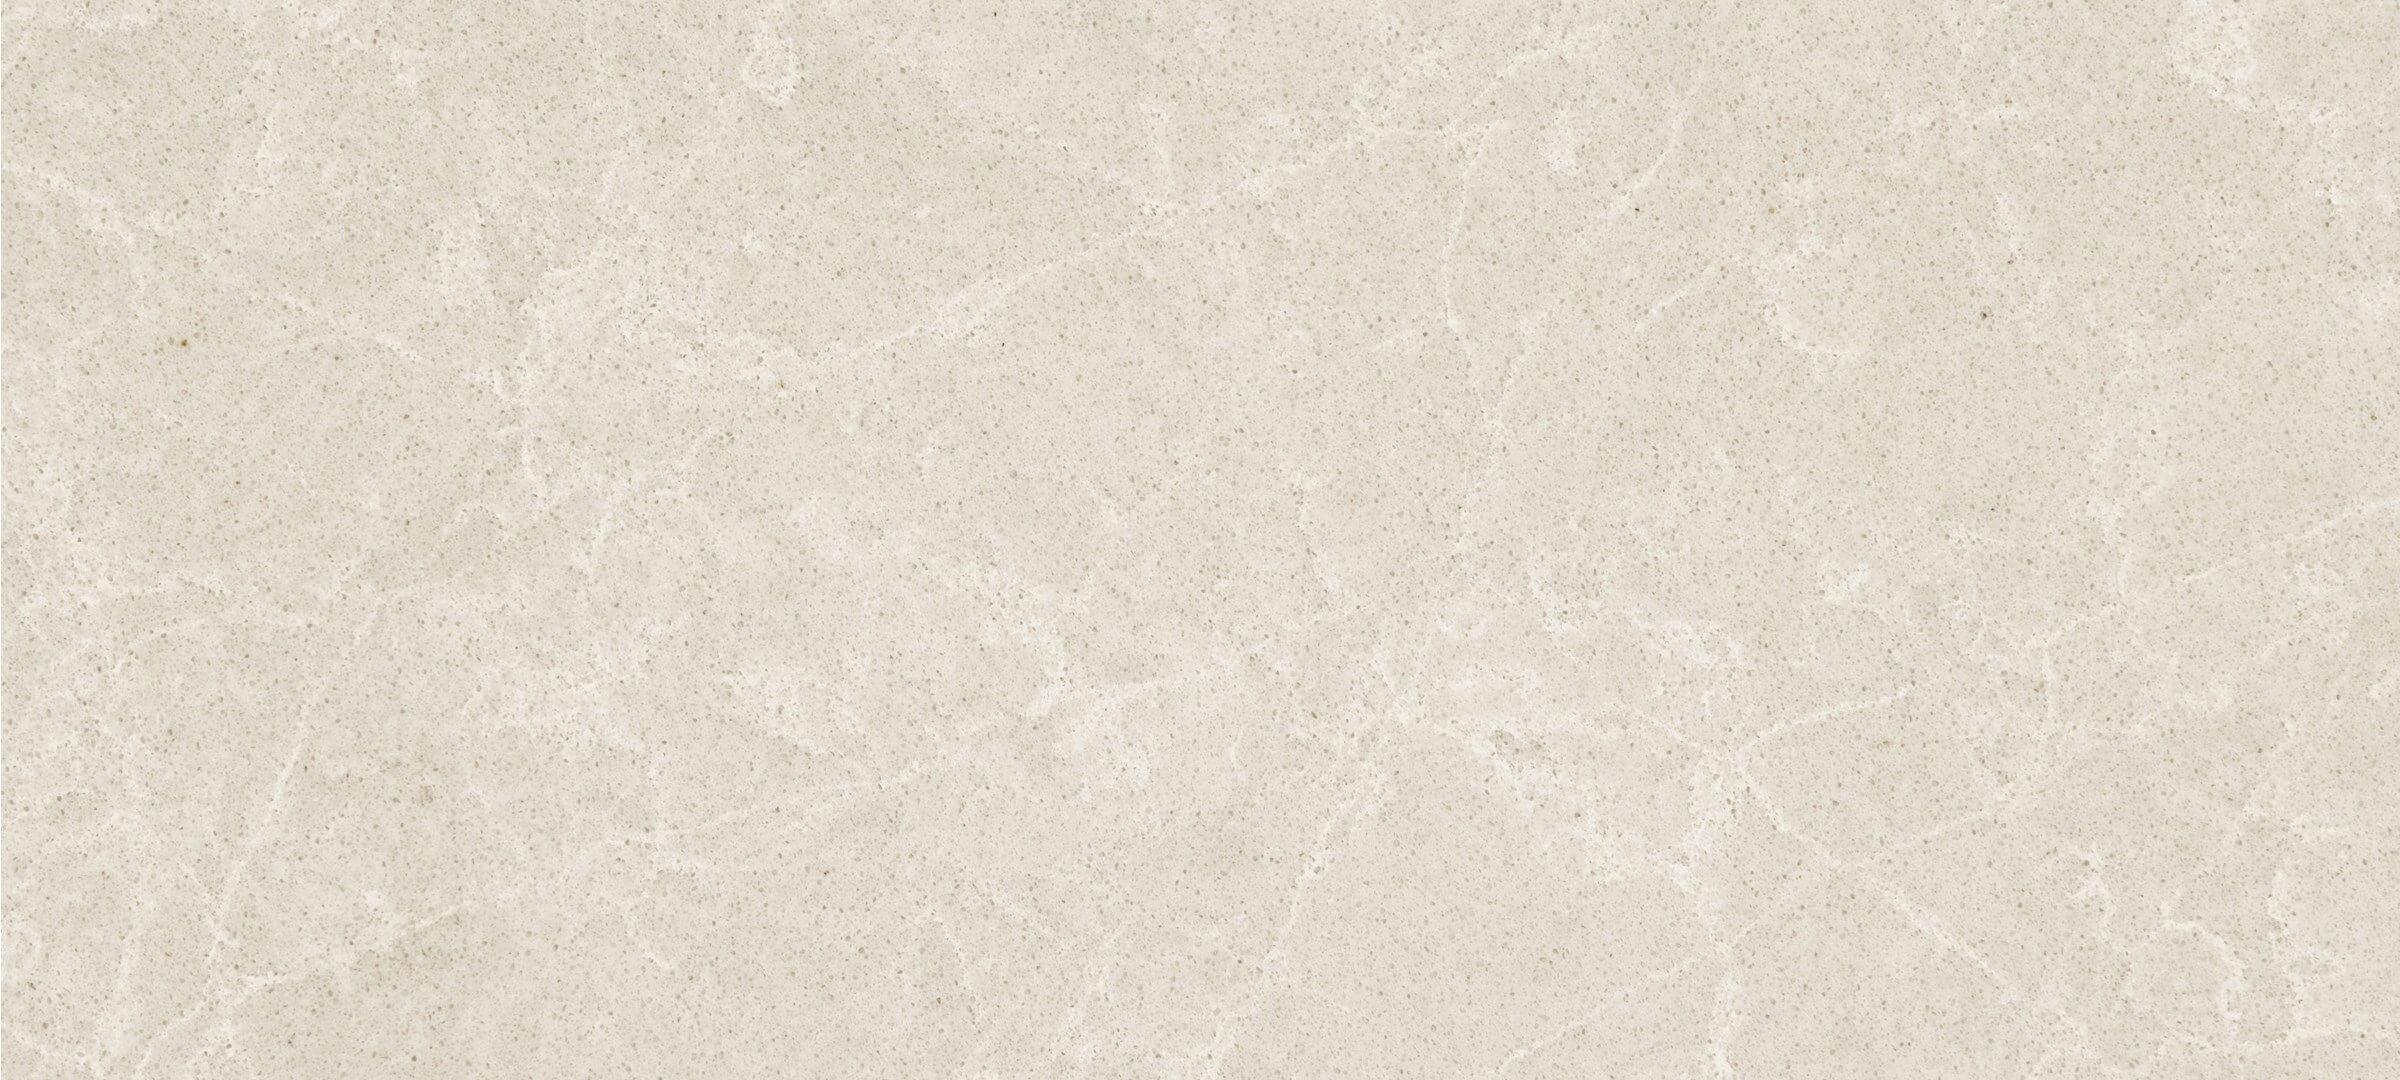 Cosmopolitan White Quartz